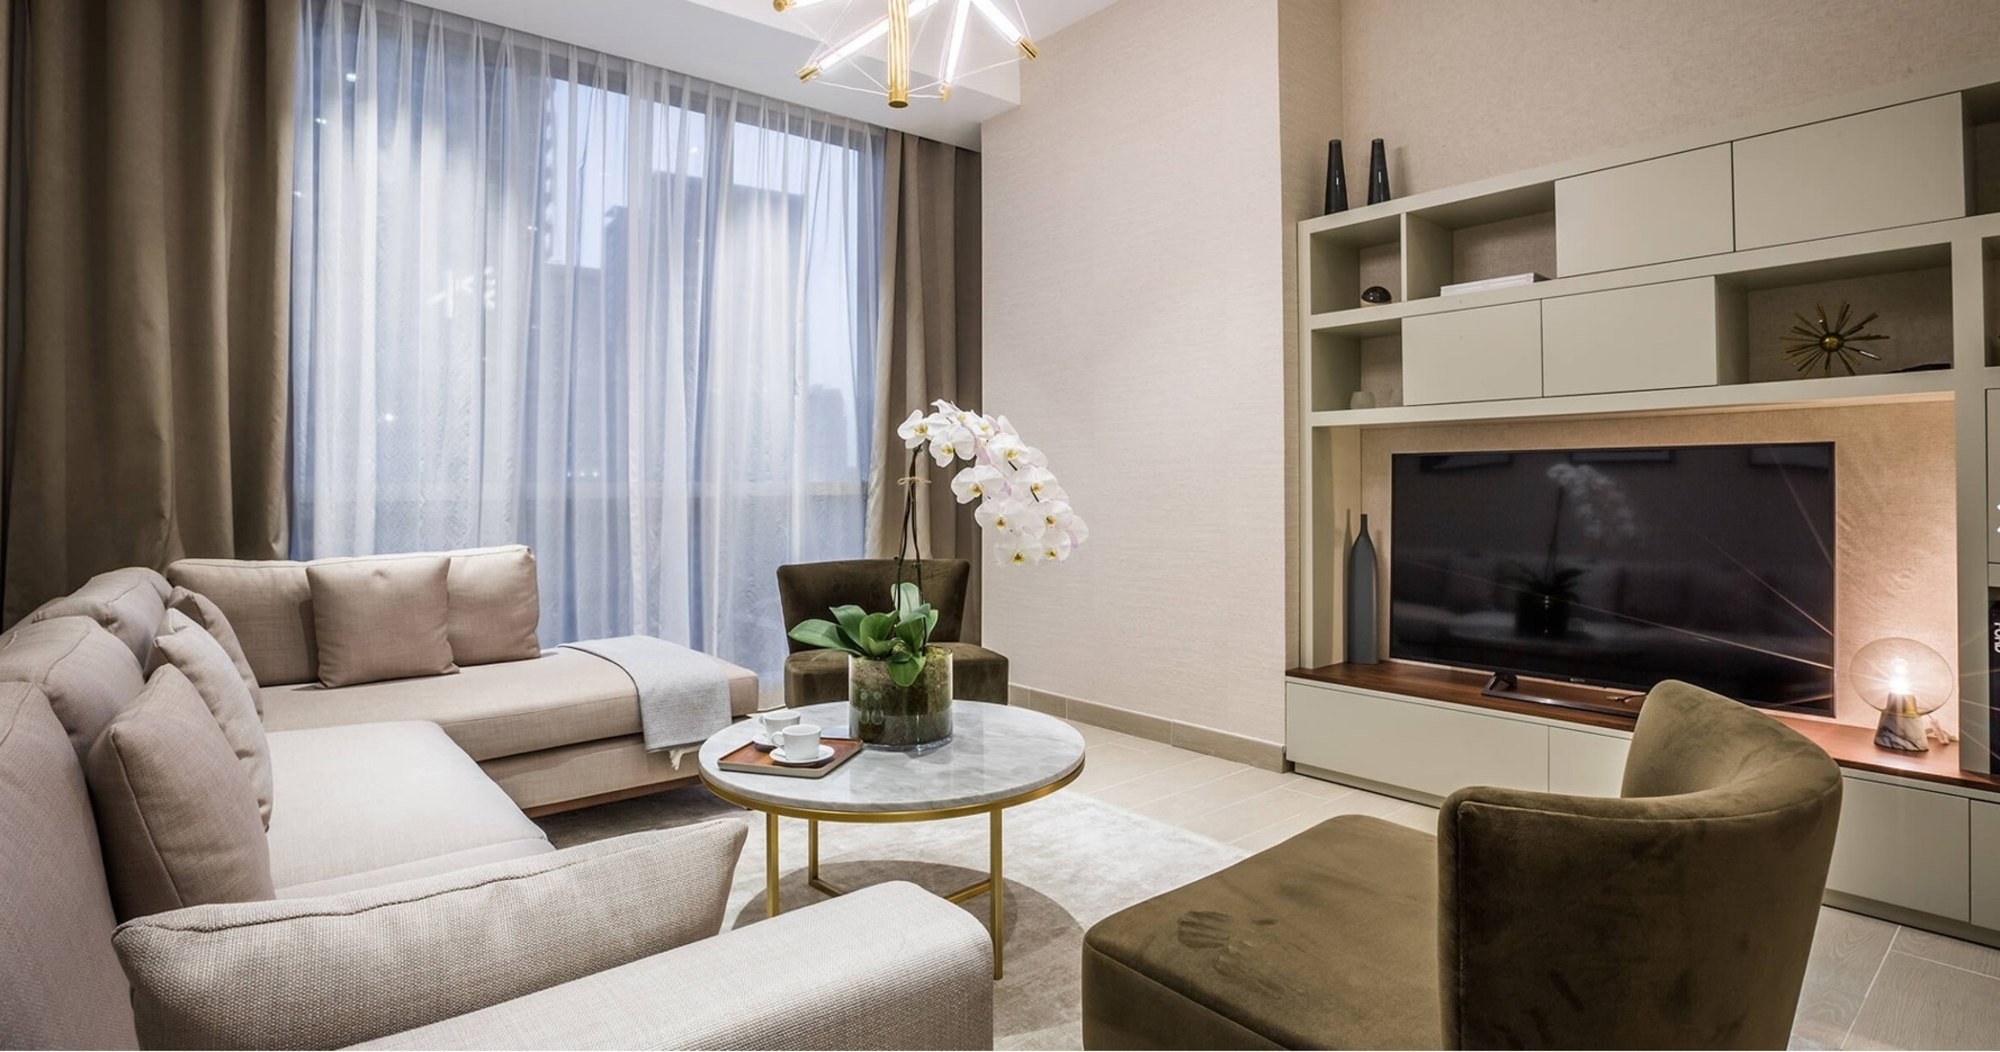 Elegant brand new apartment with full marina view